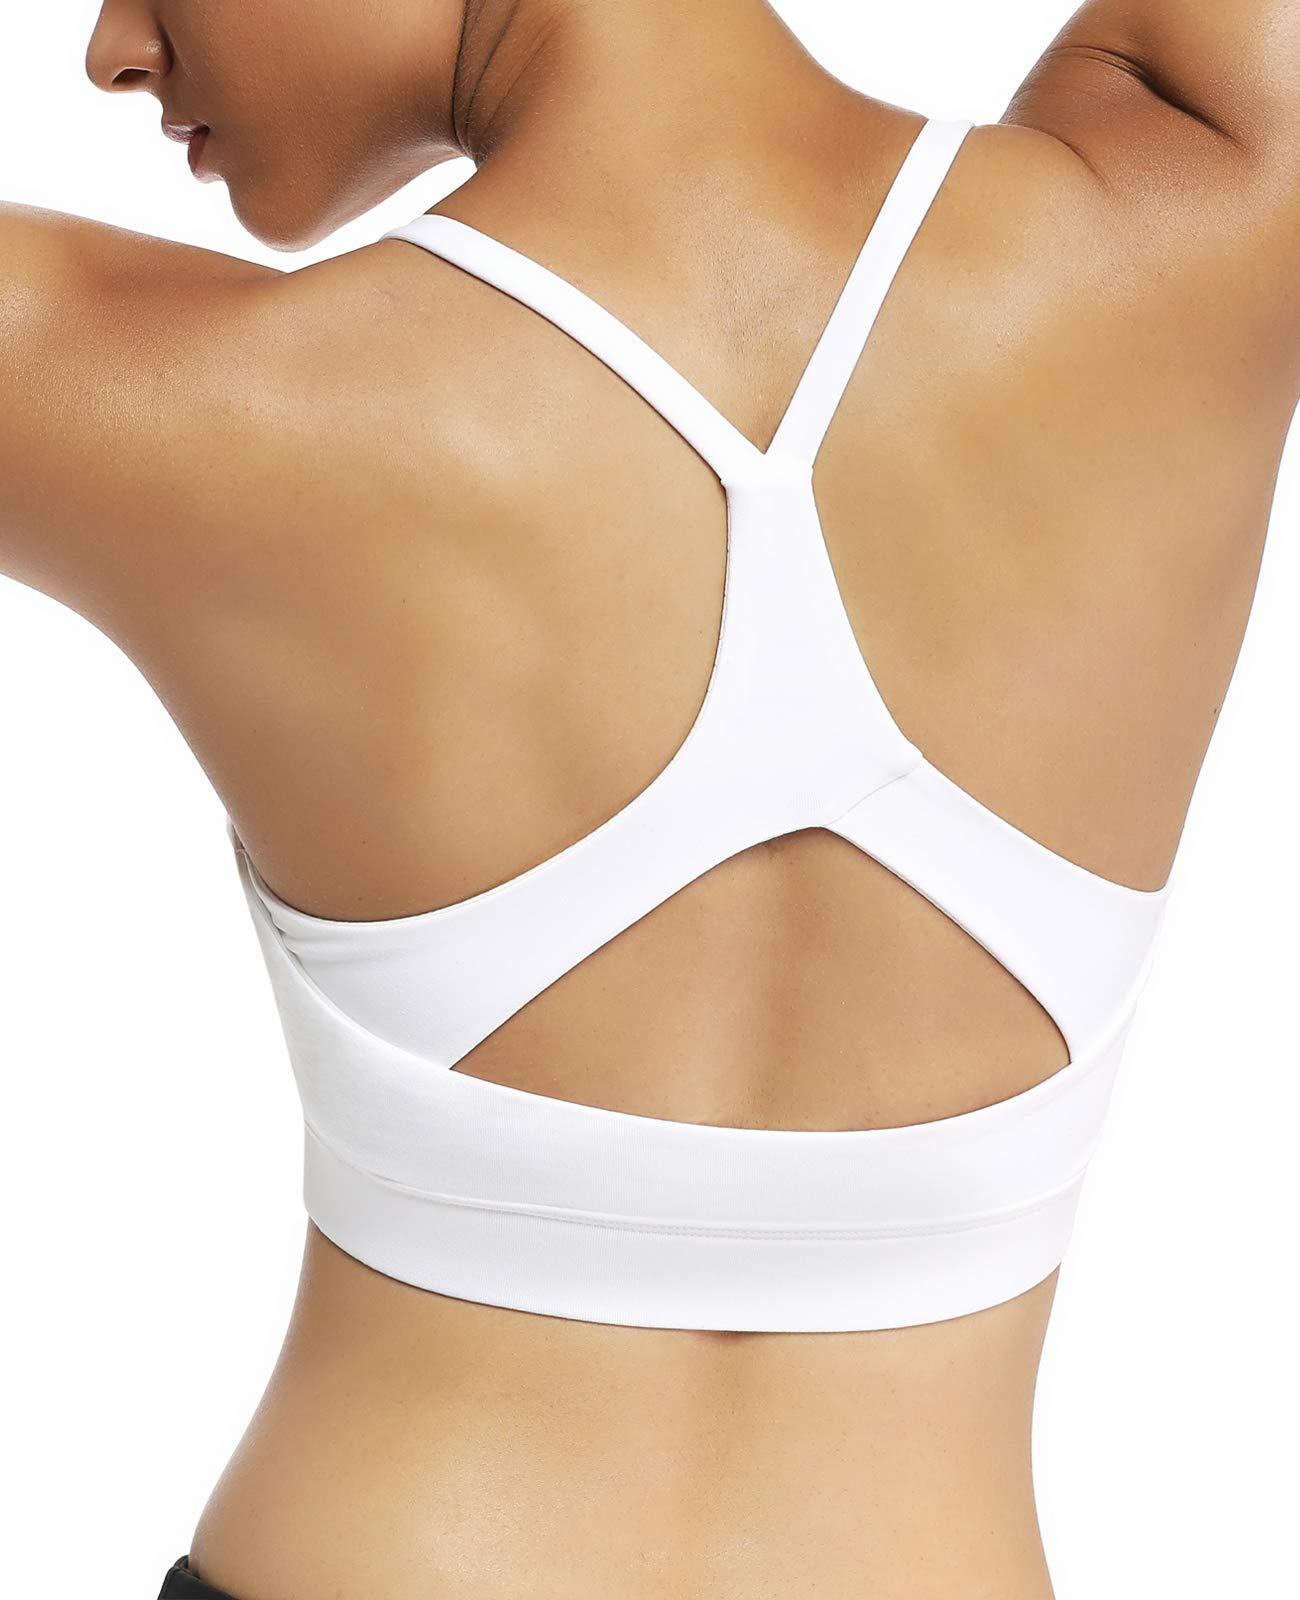 ifeolo Padded Strappy Sports Bra for Women Cross Back Medium Support Workout Running Yoga Bra